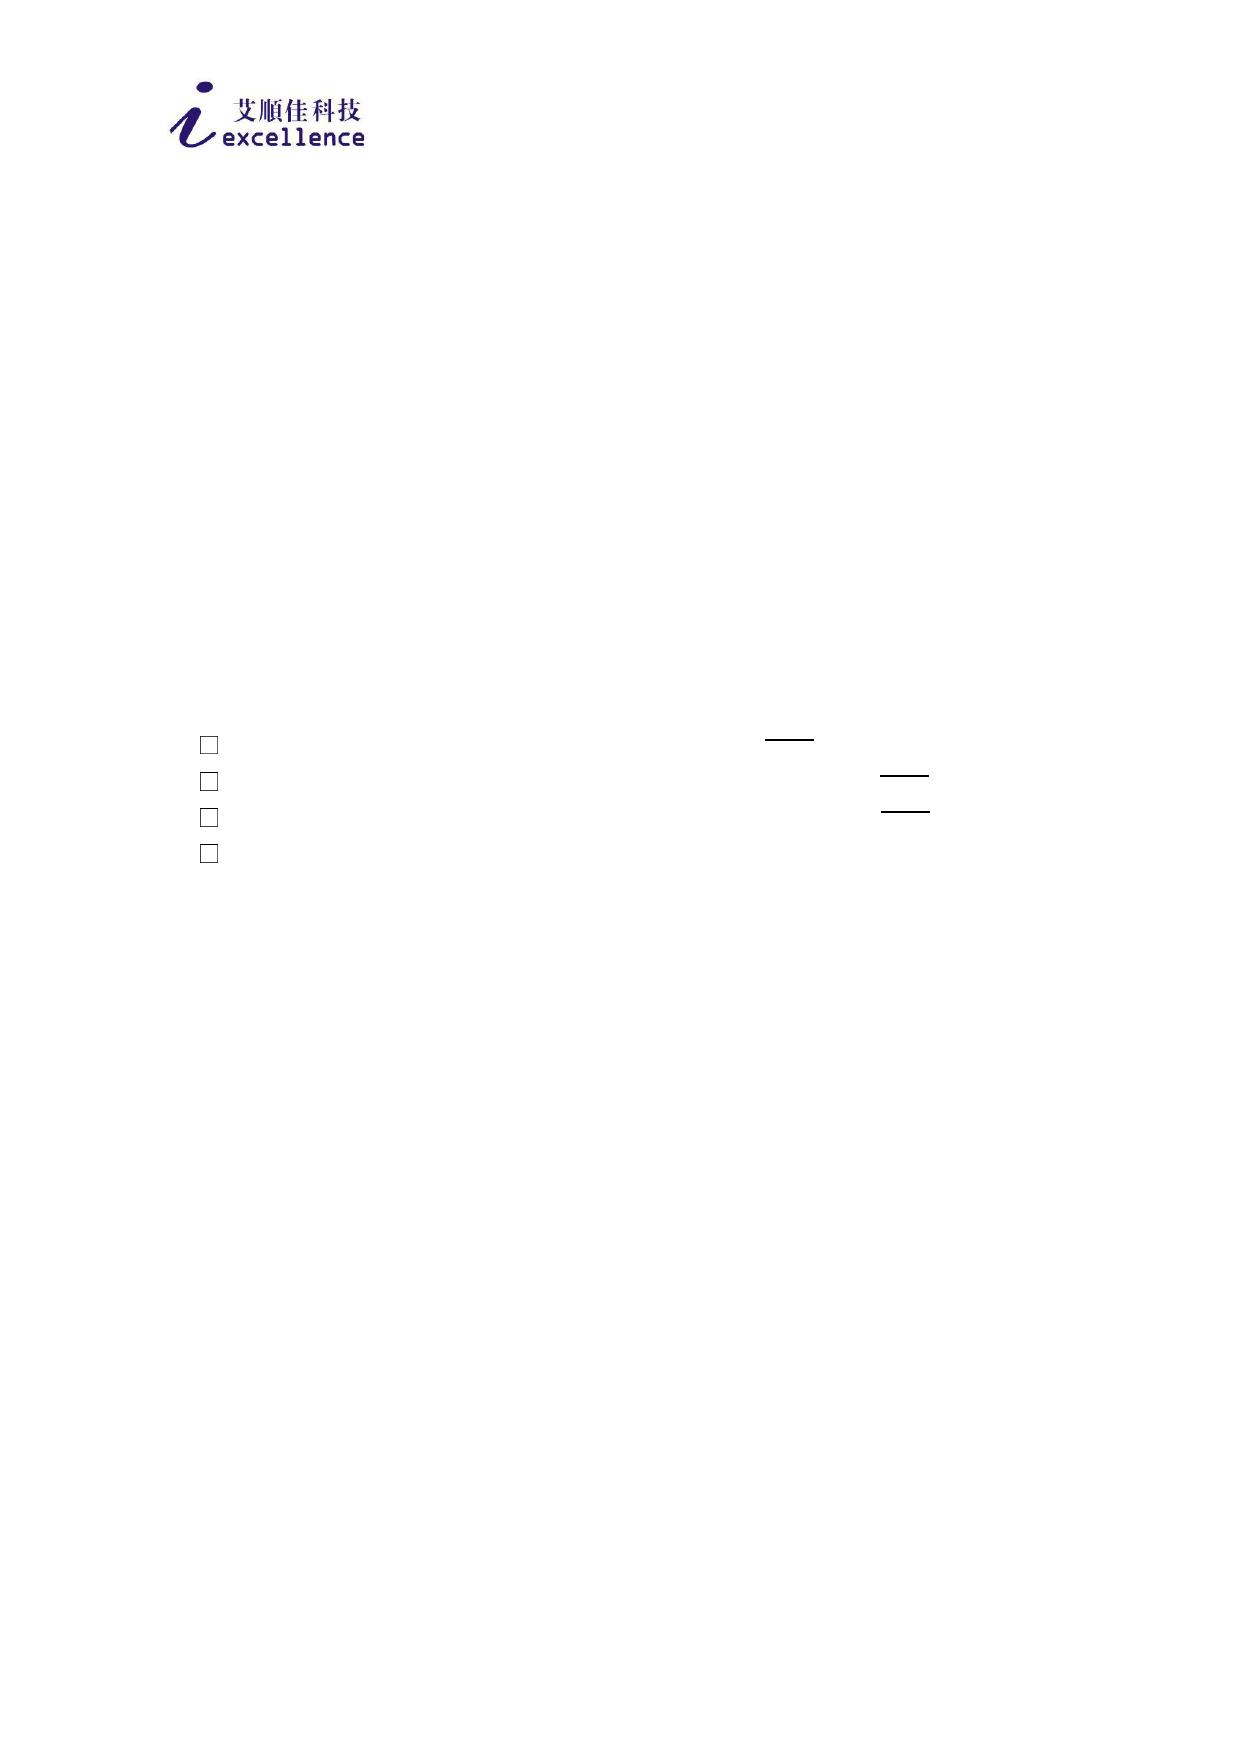 X139BLB01 دیتاشیت PDF